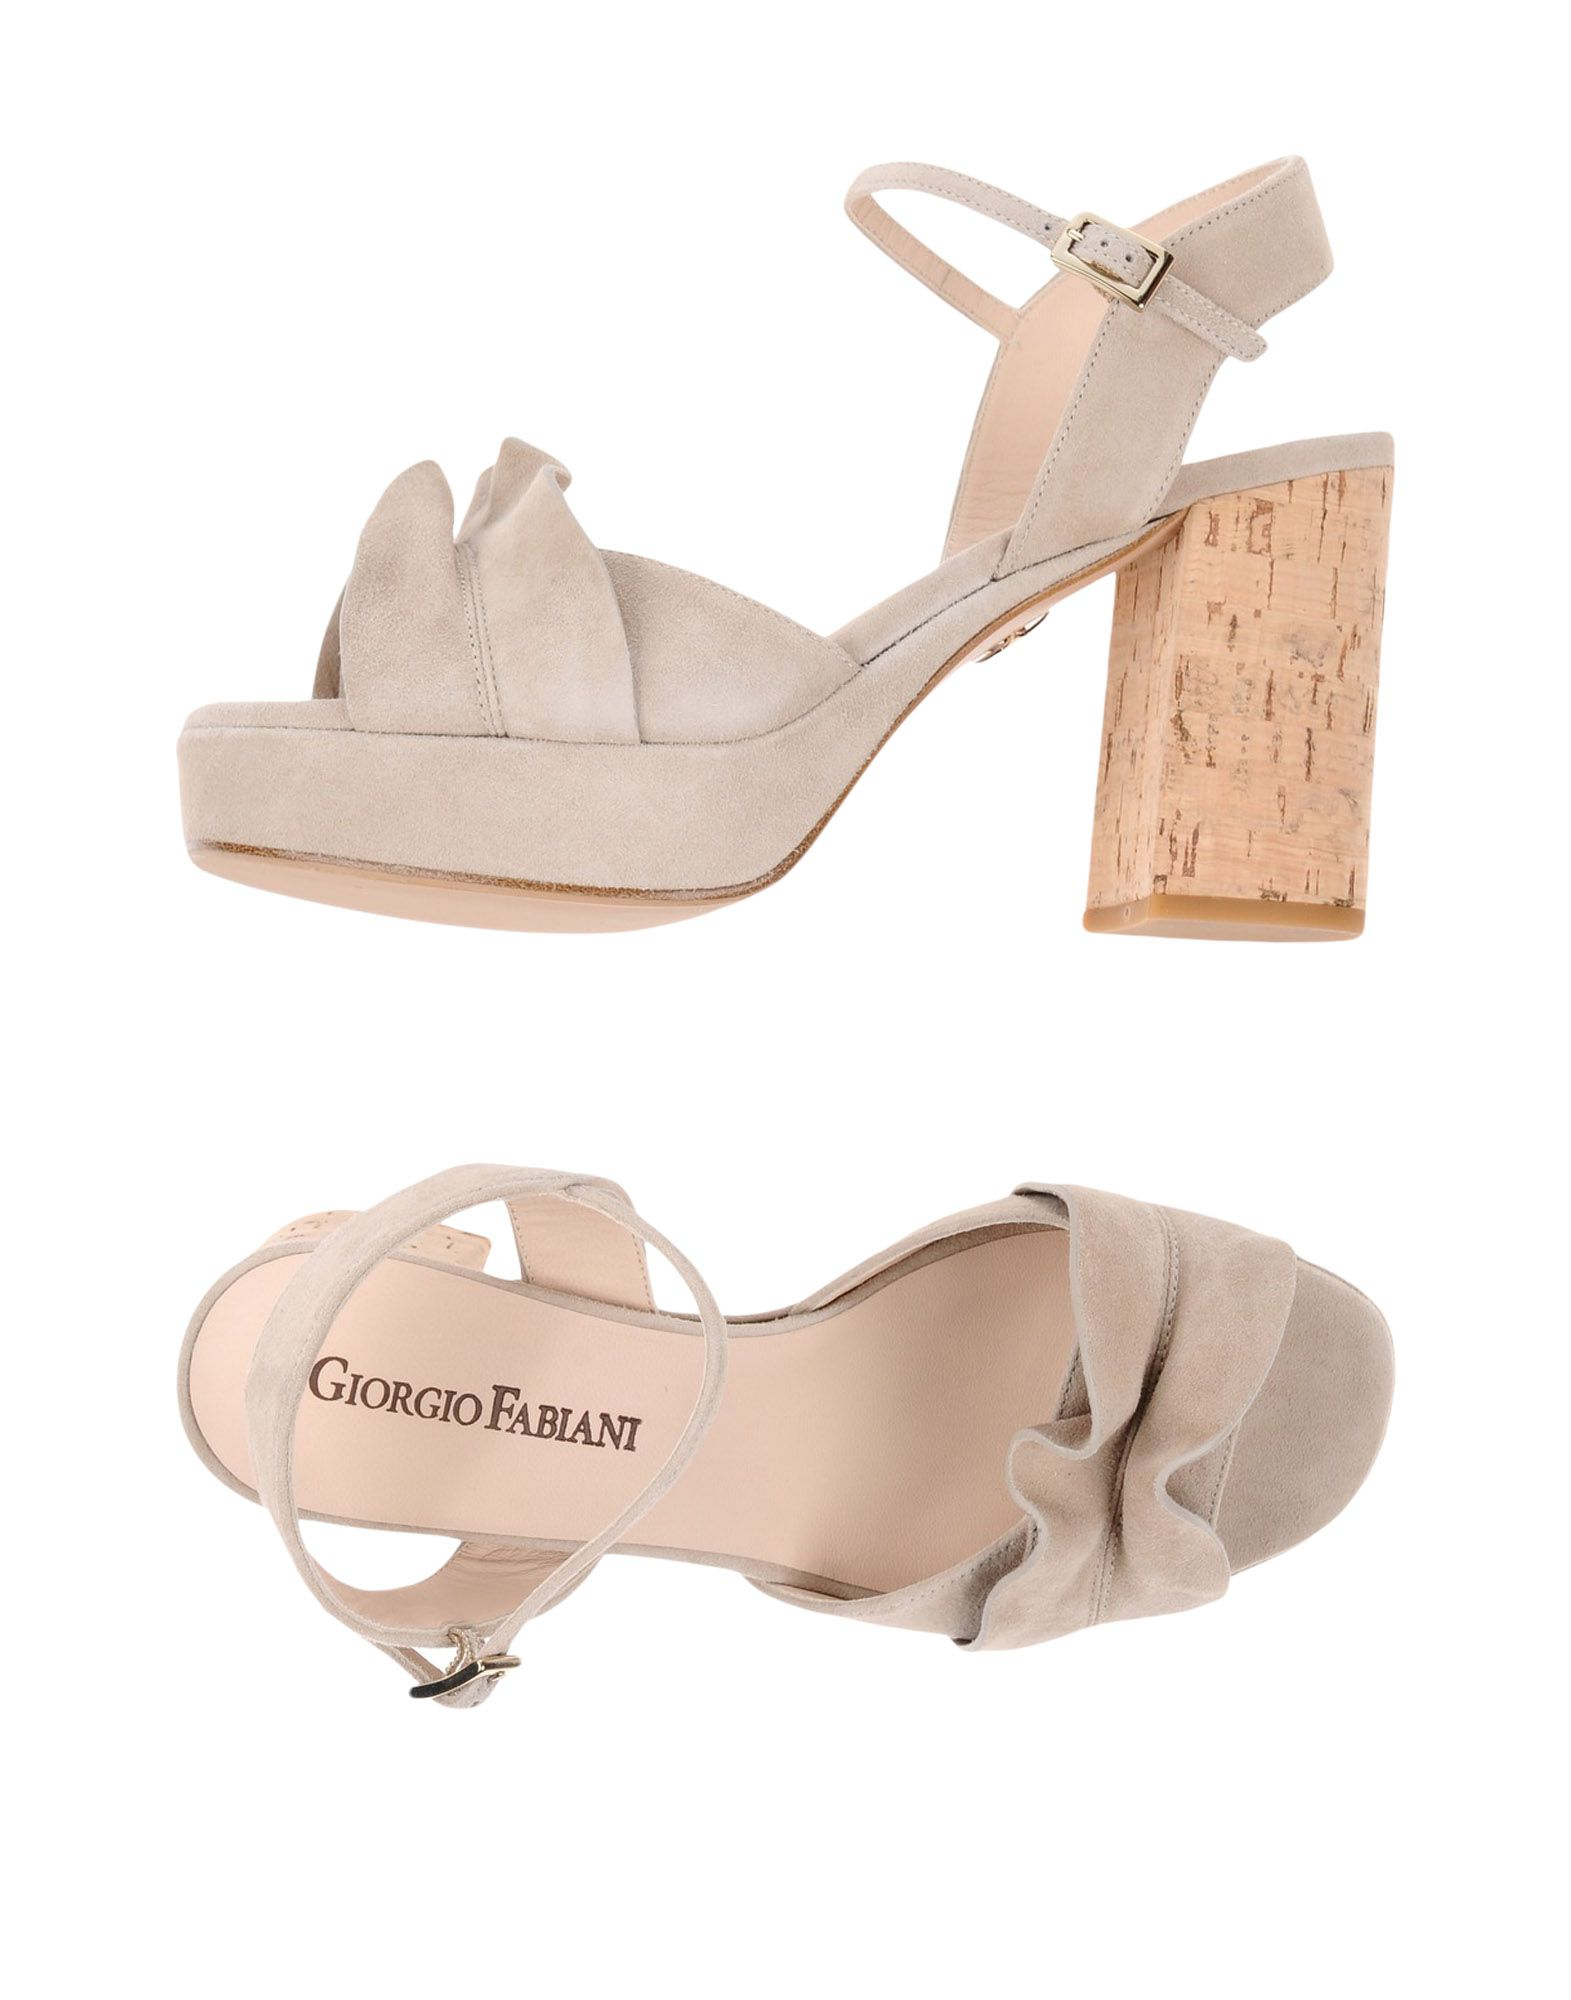 Giorgio Fabiani Sandalen Damen  11332938WA Gute Qualität beliebte Schuhe